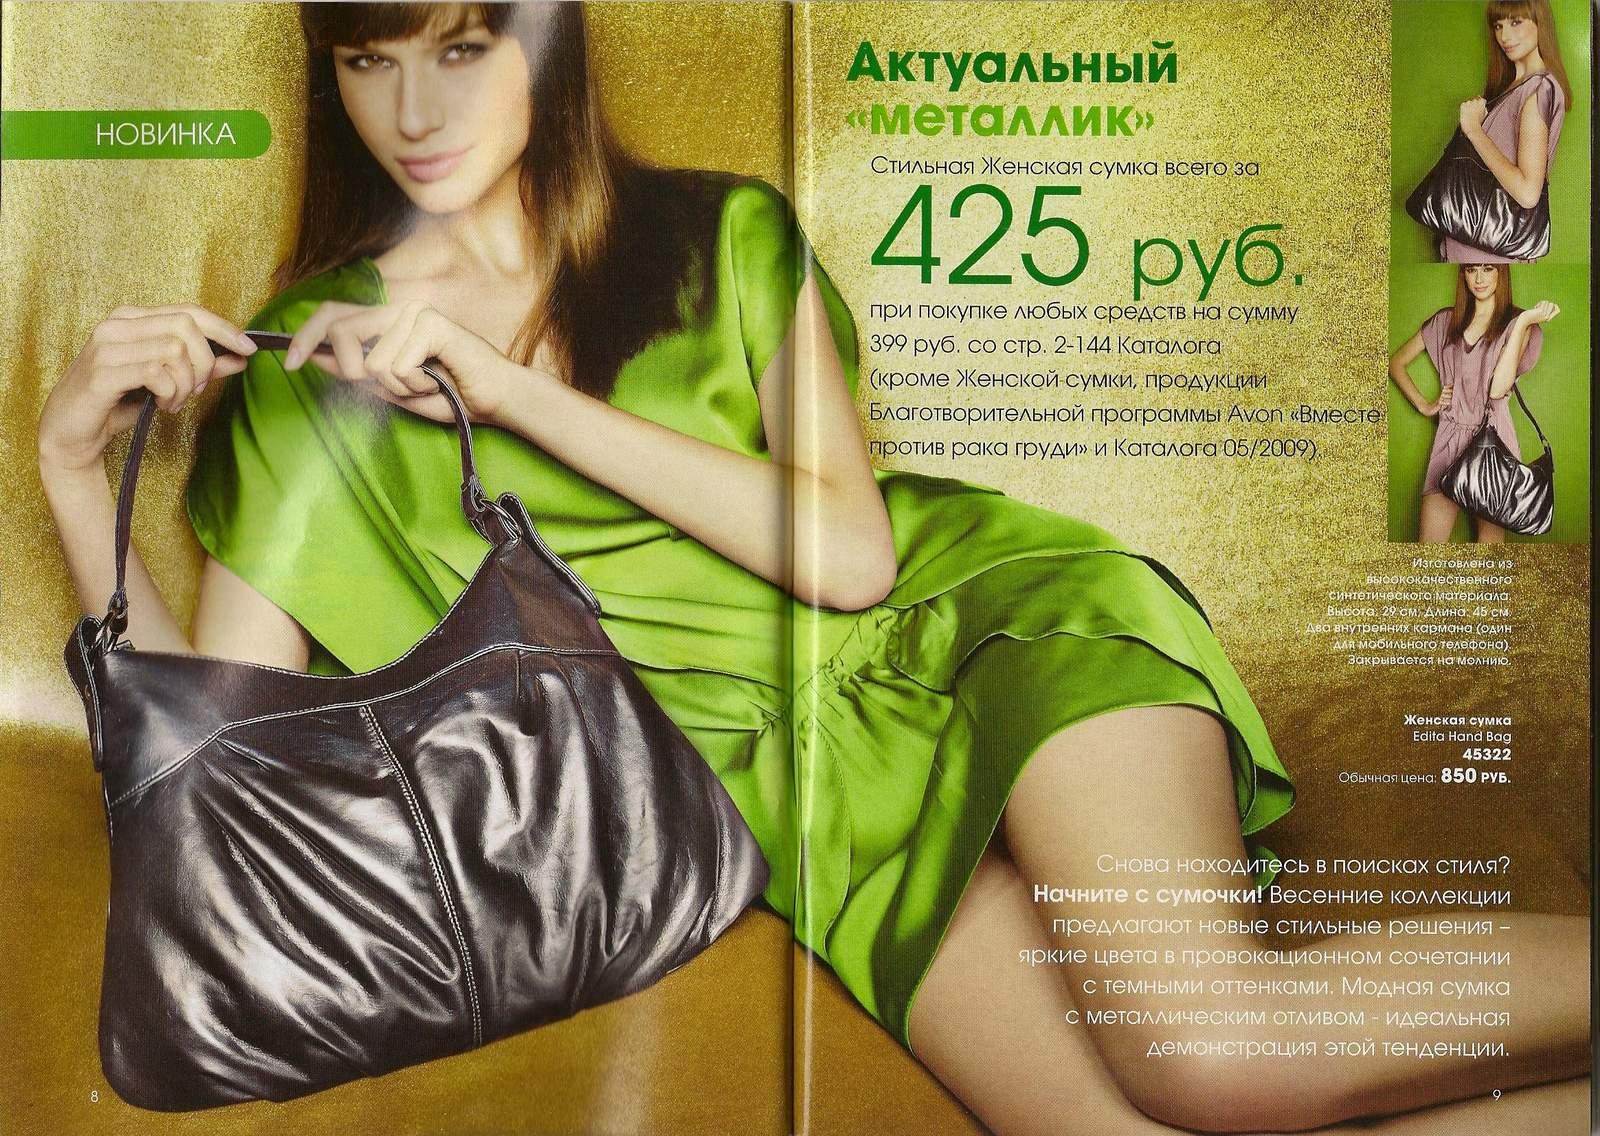 Эйвон каталог 2009 года 13 фотография